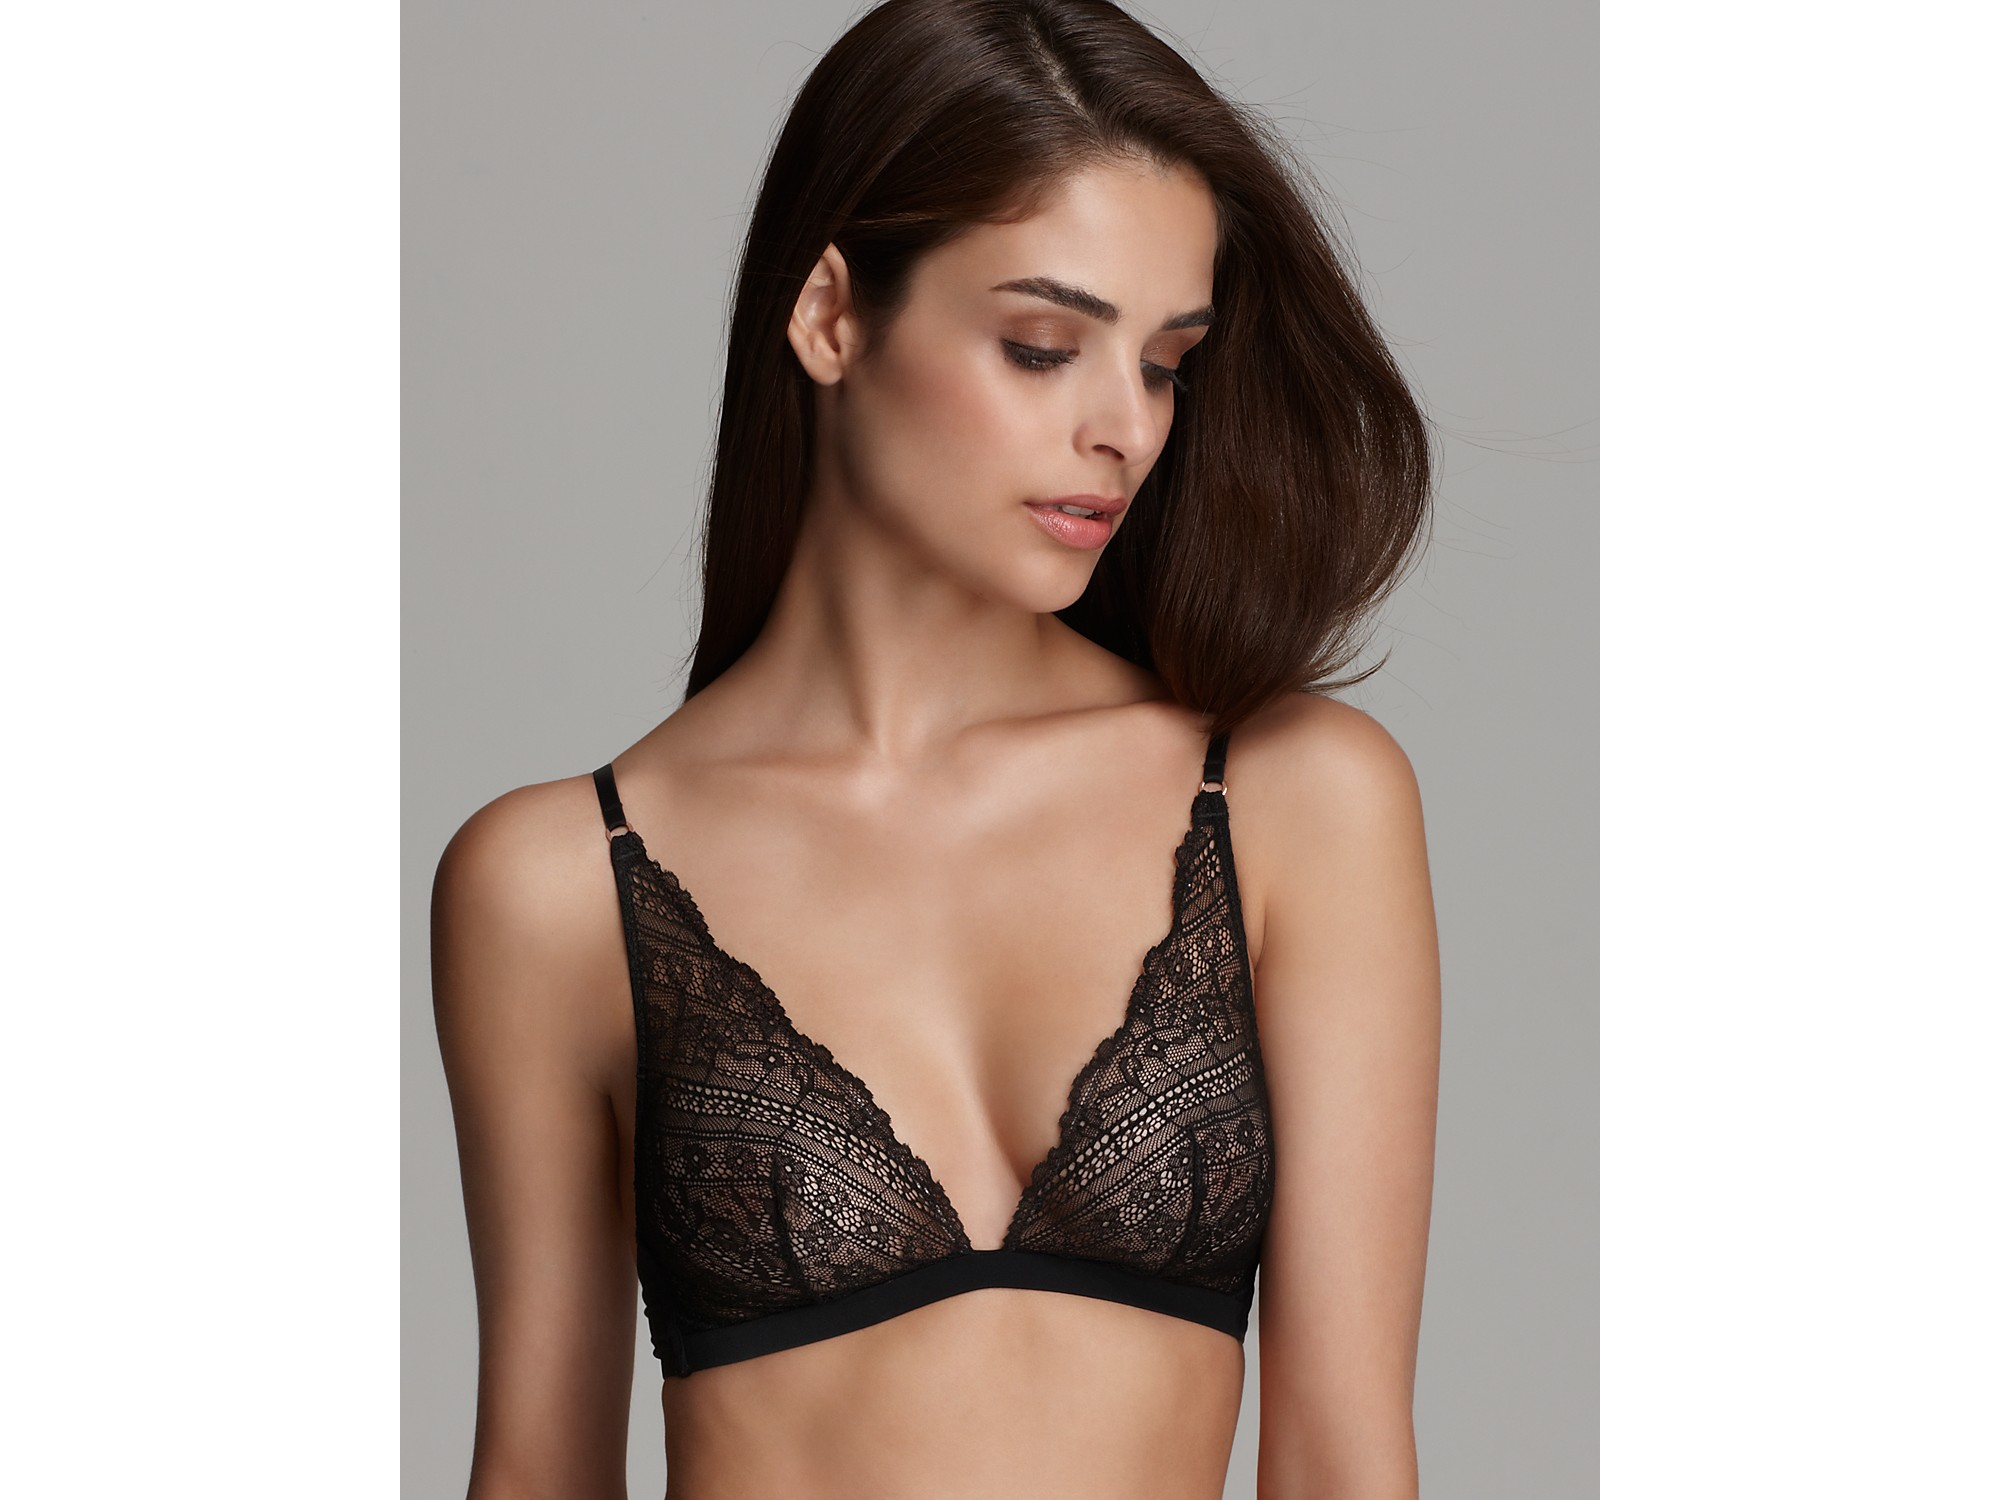 ede9976ca2c Lyst - Calvin Klein Underwear Envy Lace Triangle Bra in Black